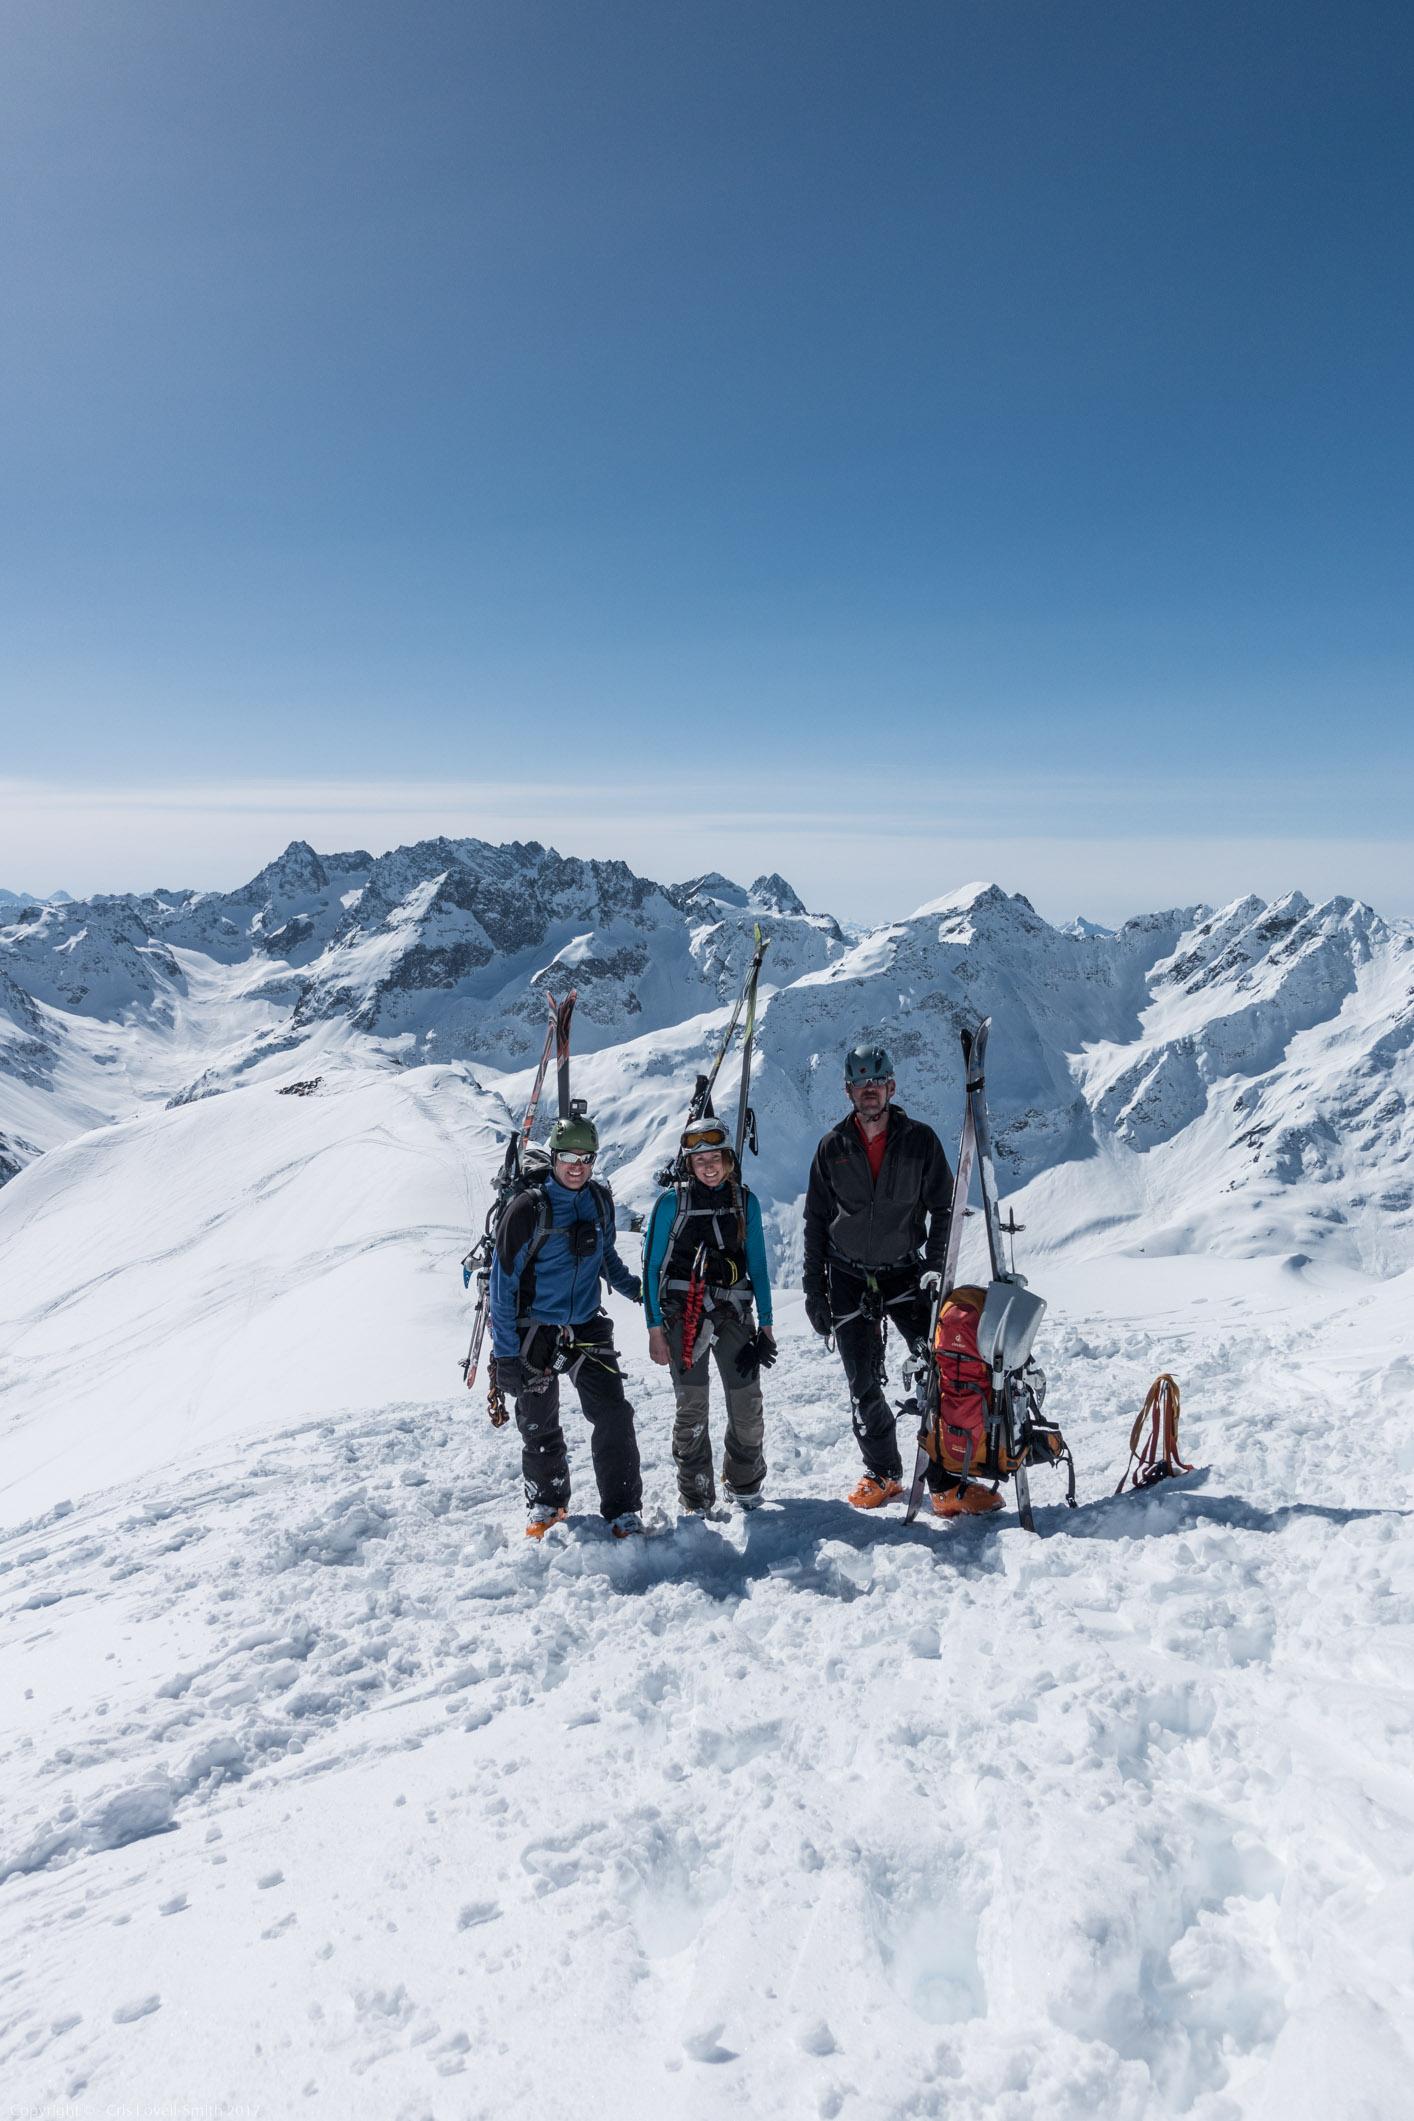 Us on the Mitterkarspitze (Arlberger Winterklettersteig March 2017)